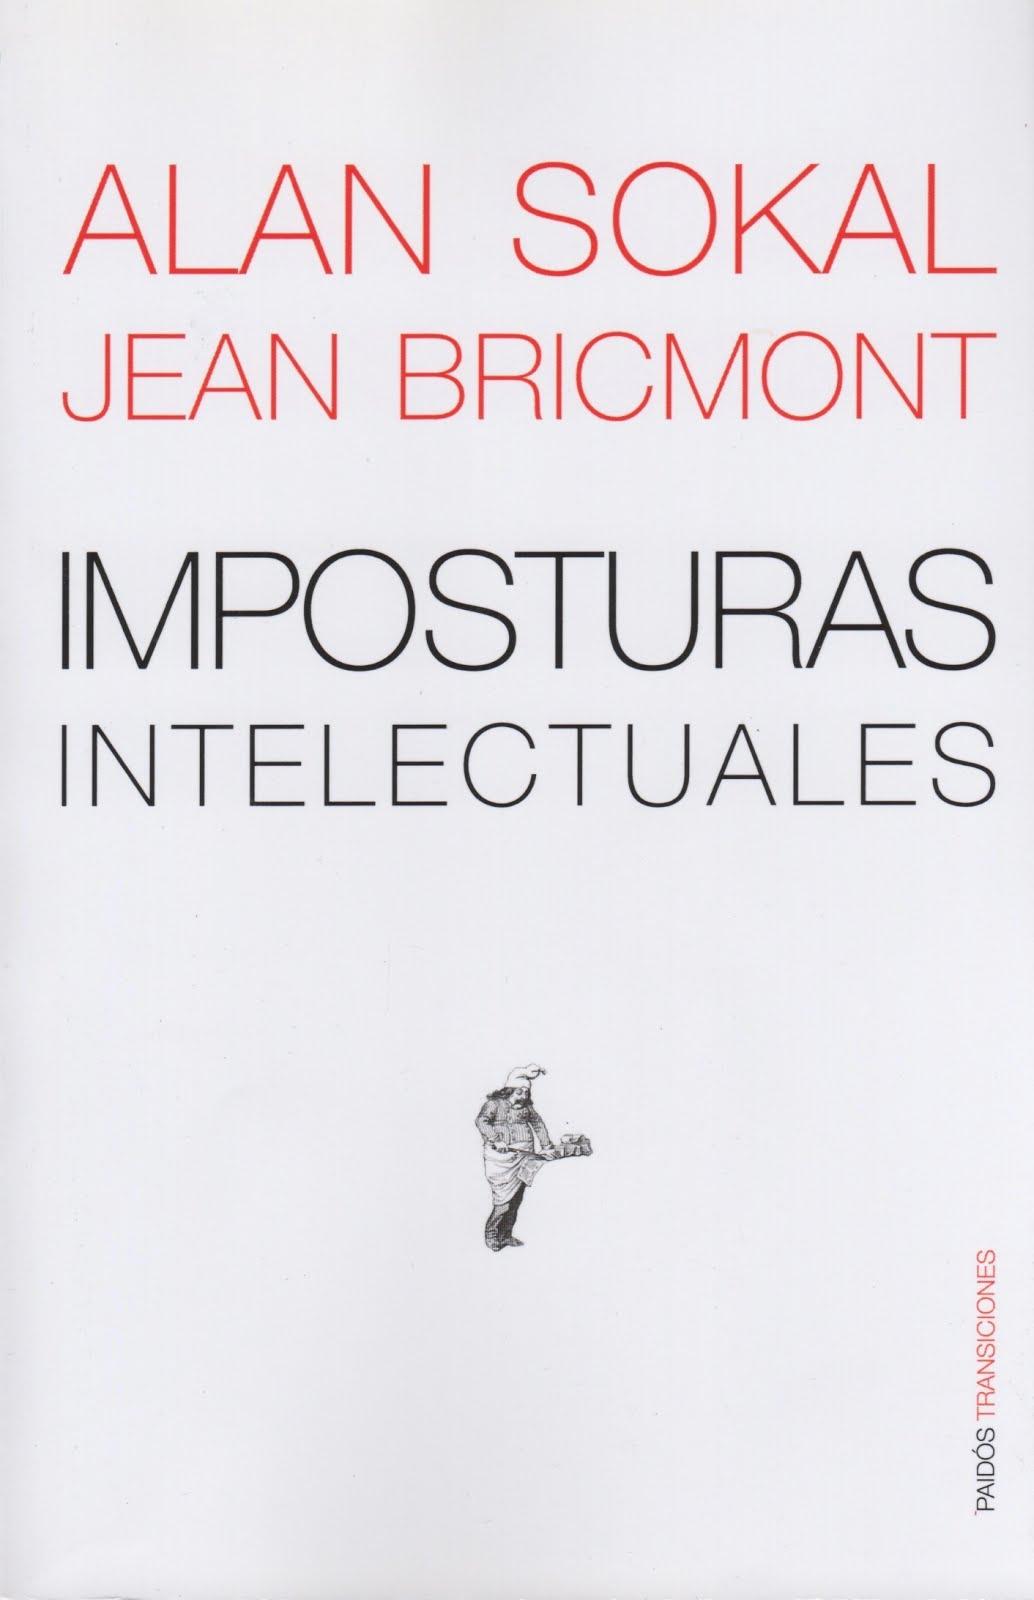 Alan Sokal - Jean Bricmont (Imposturas intelectuales)